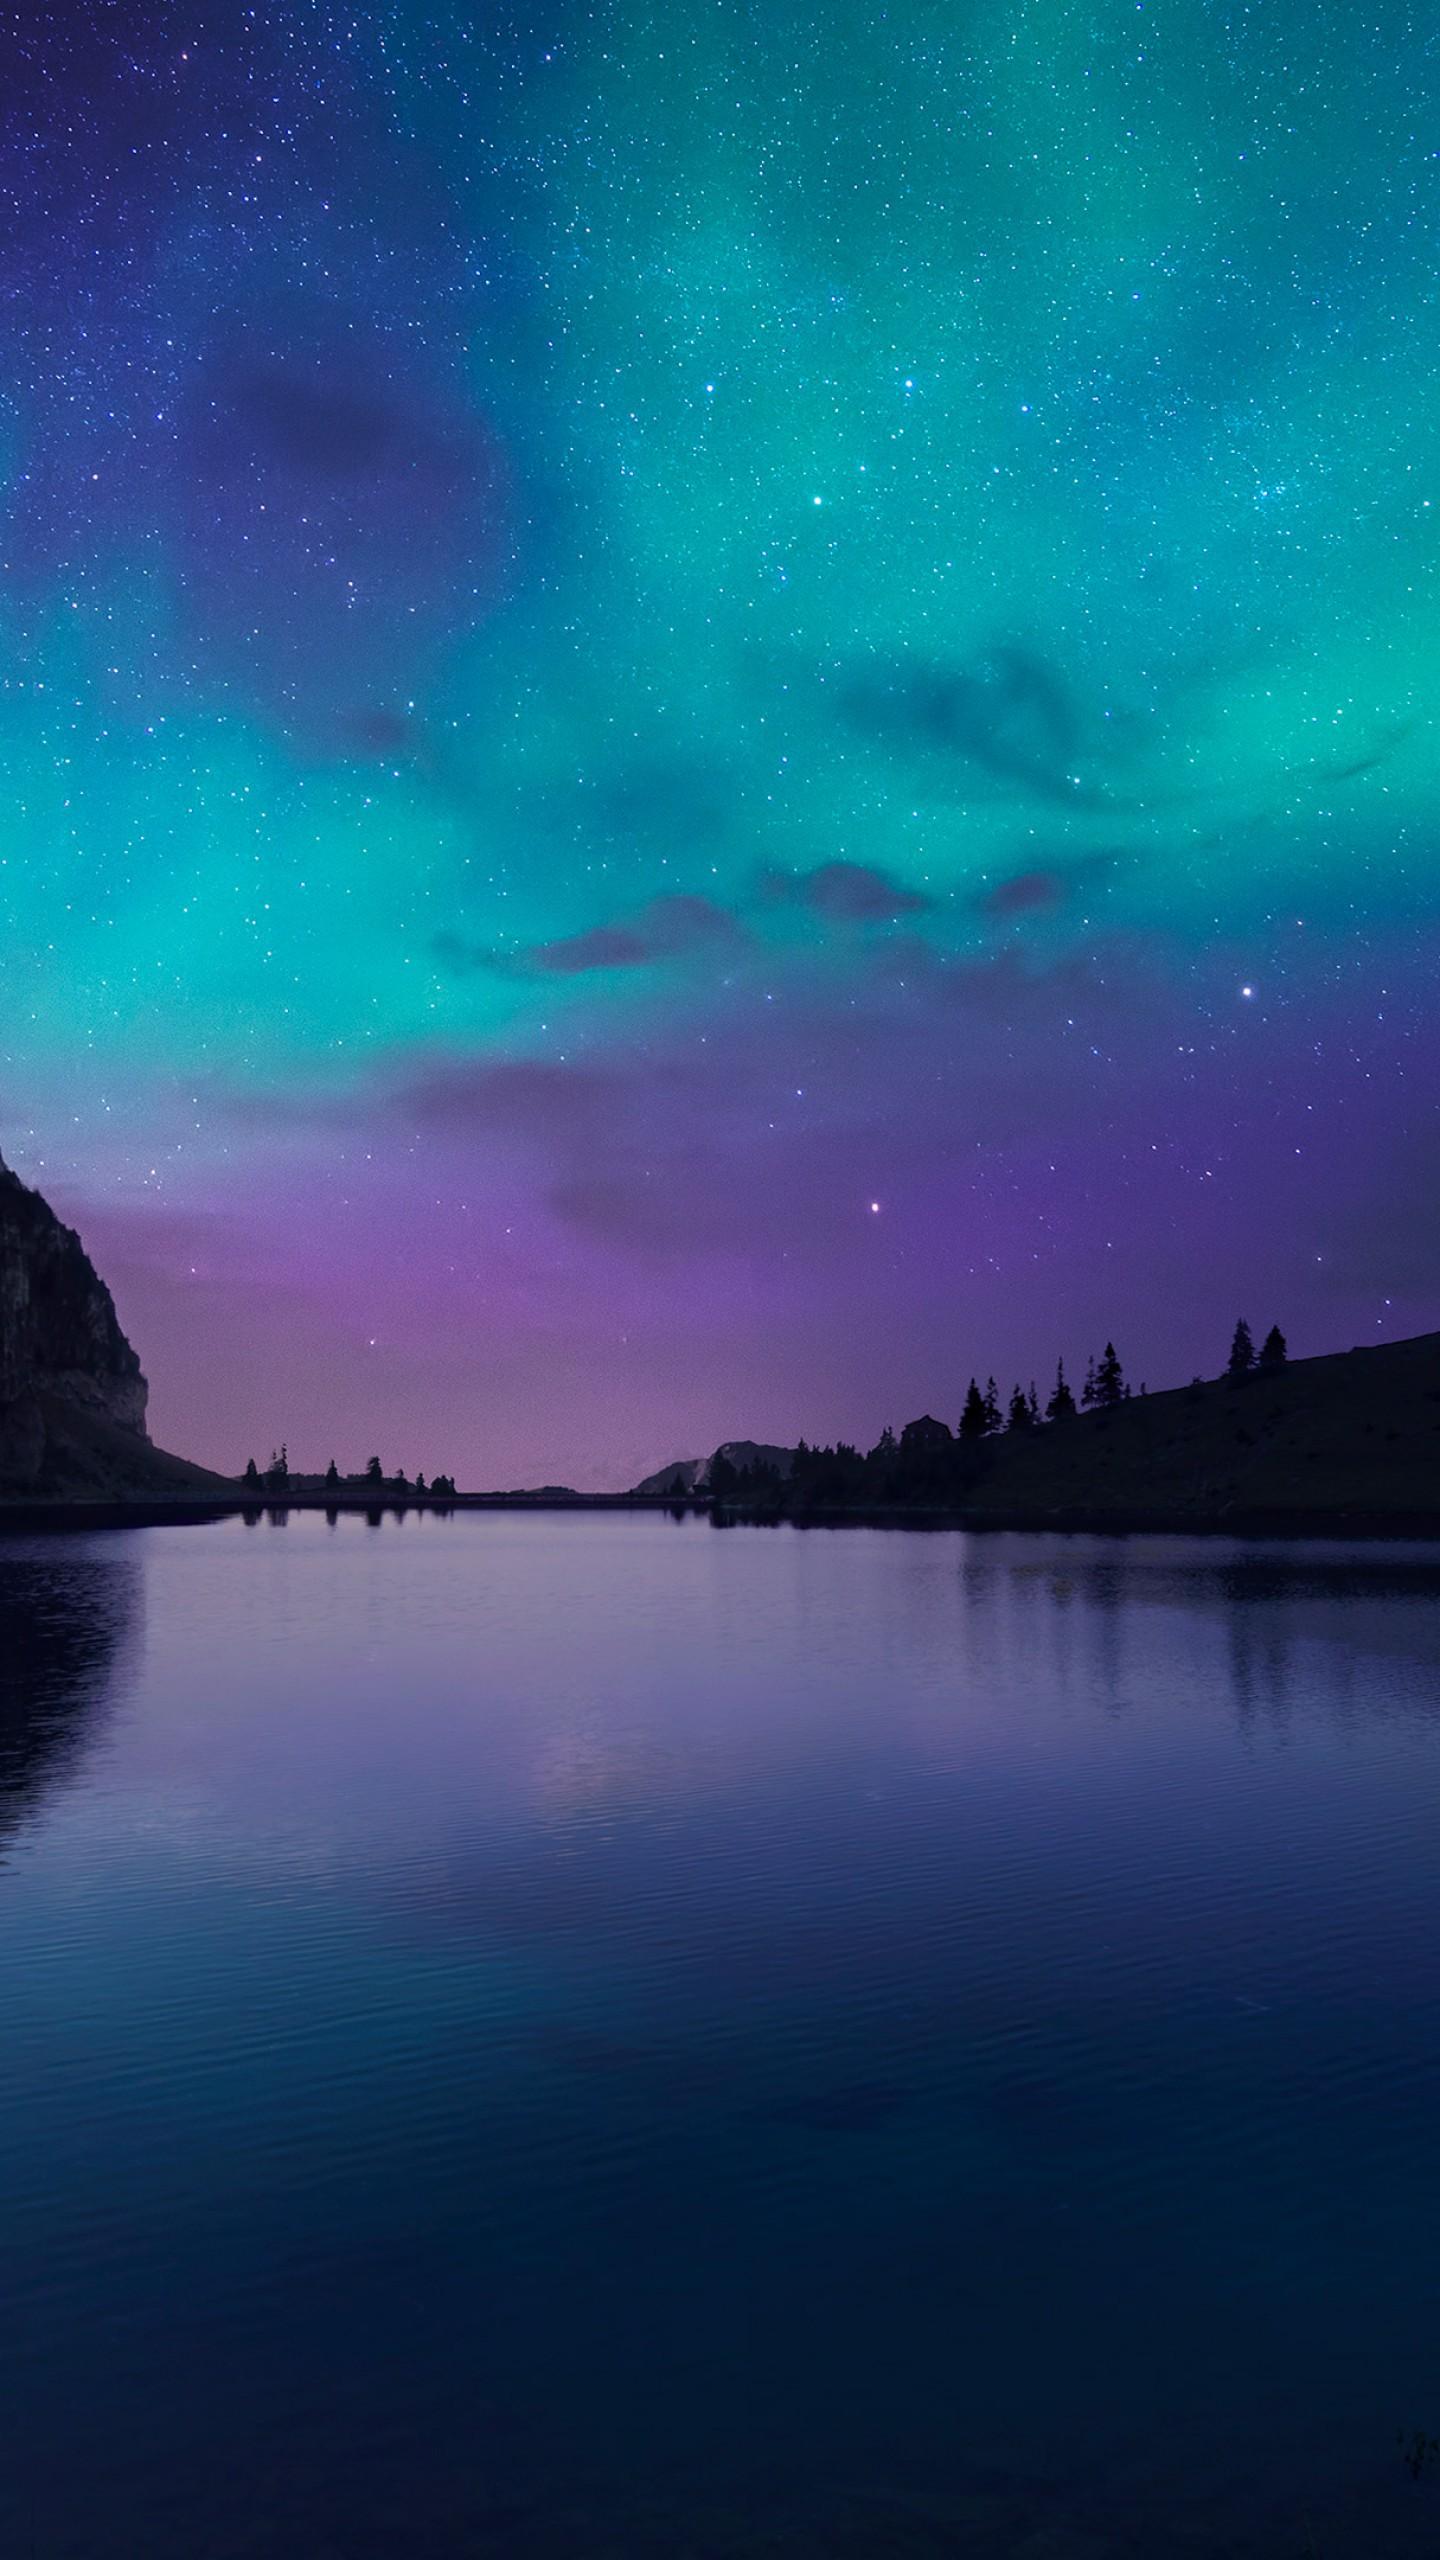 Wallpaper Lake Aurora 4k Hd Wallpaper Florida Night Sky Stars Os 12771